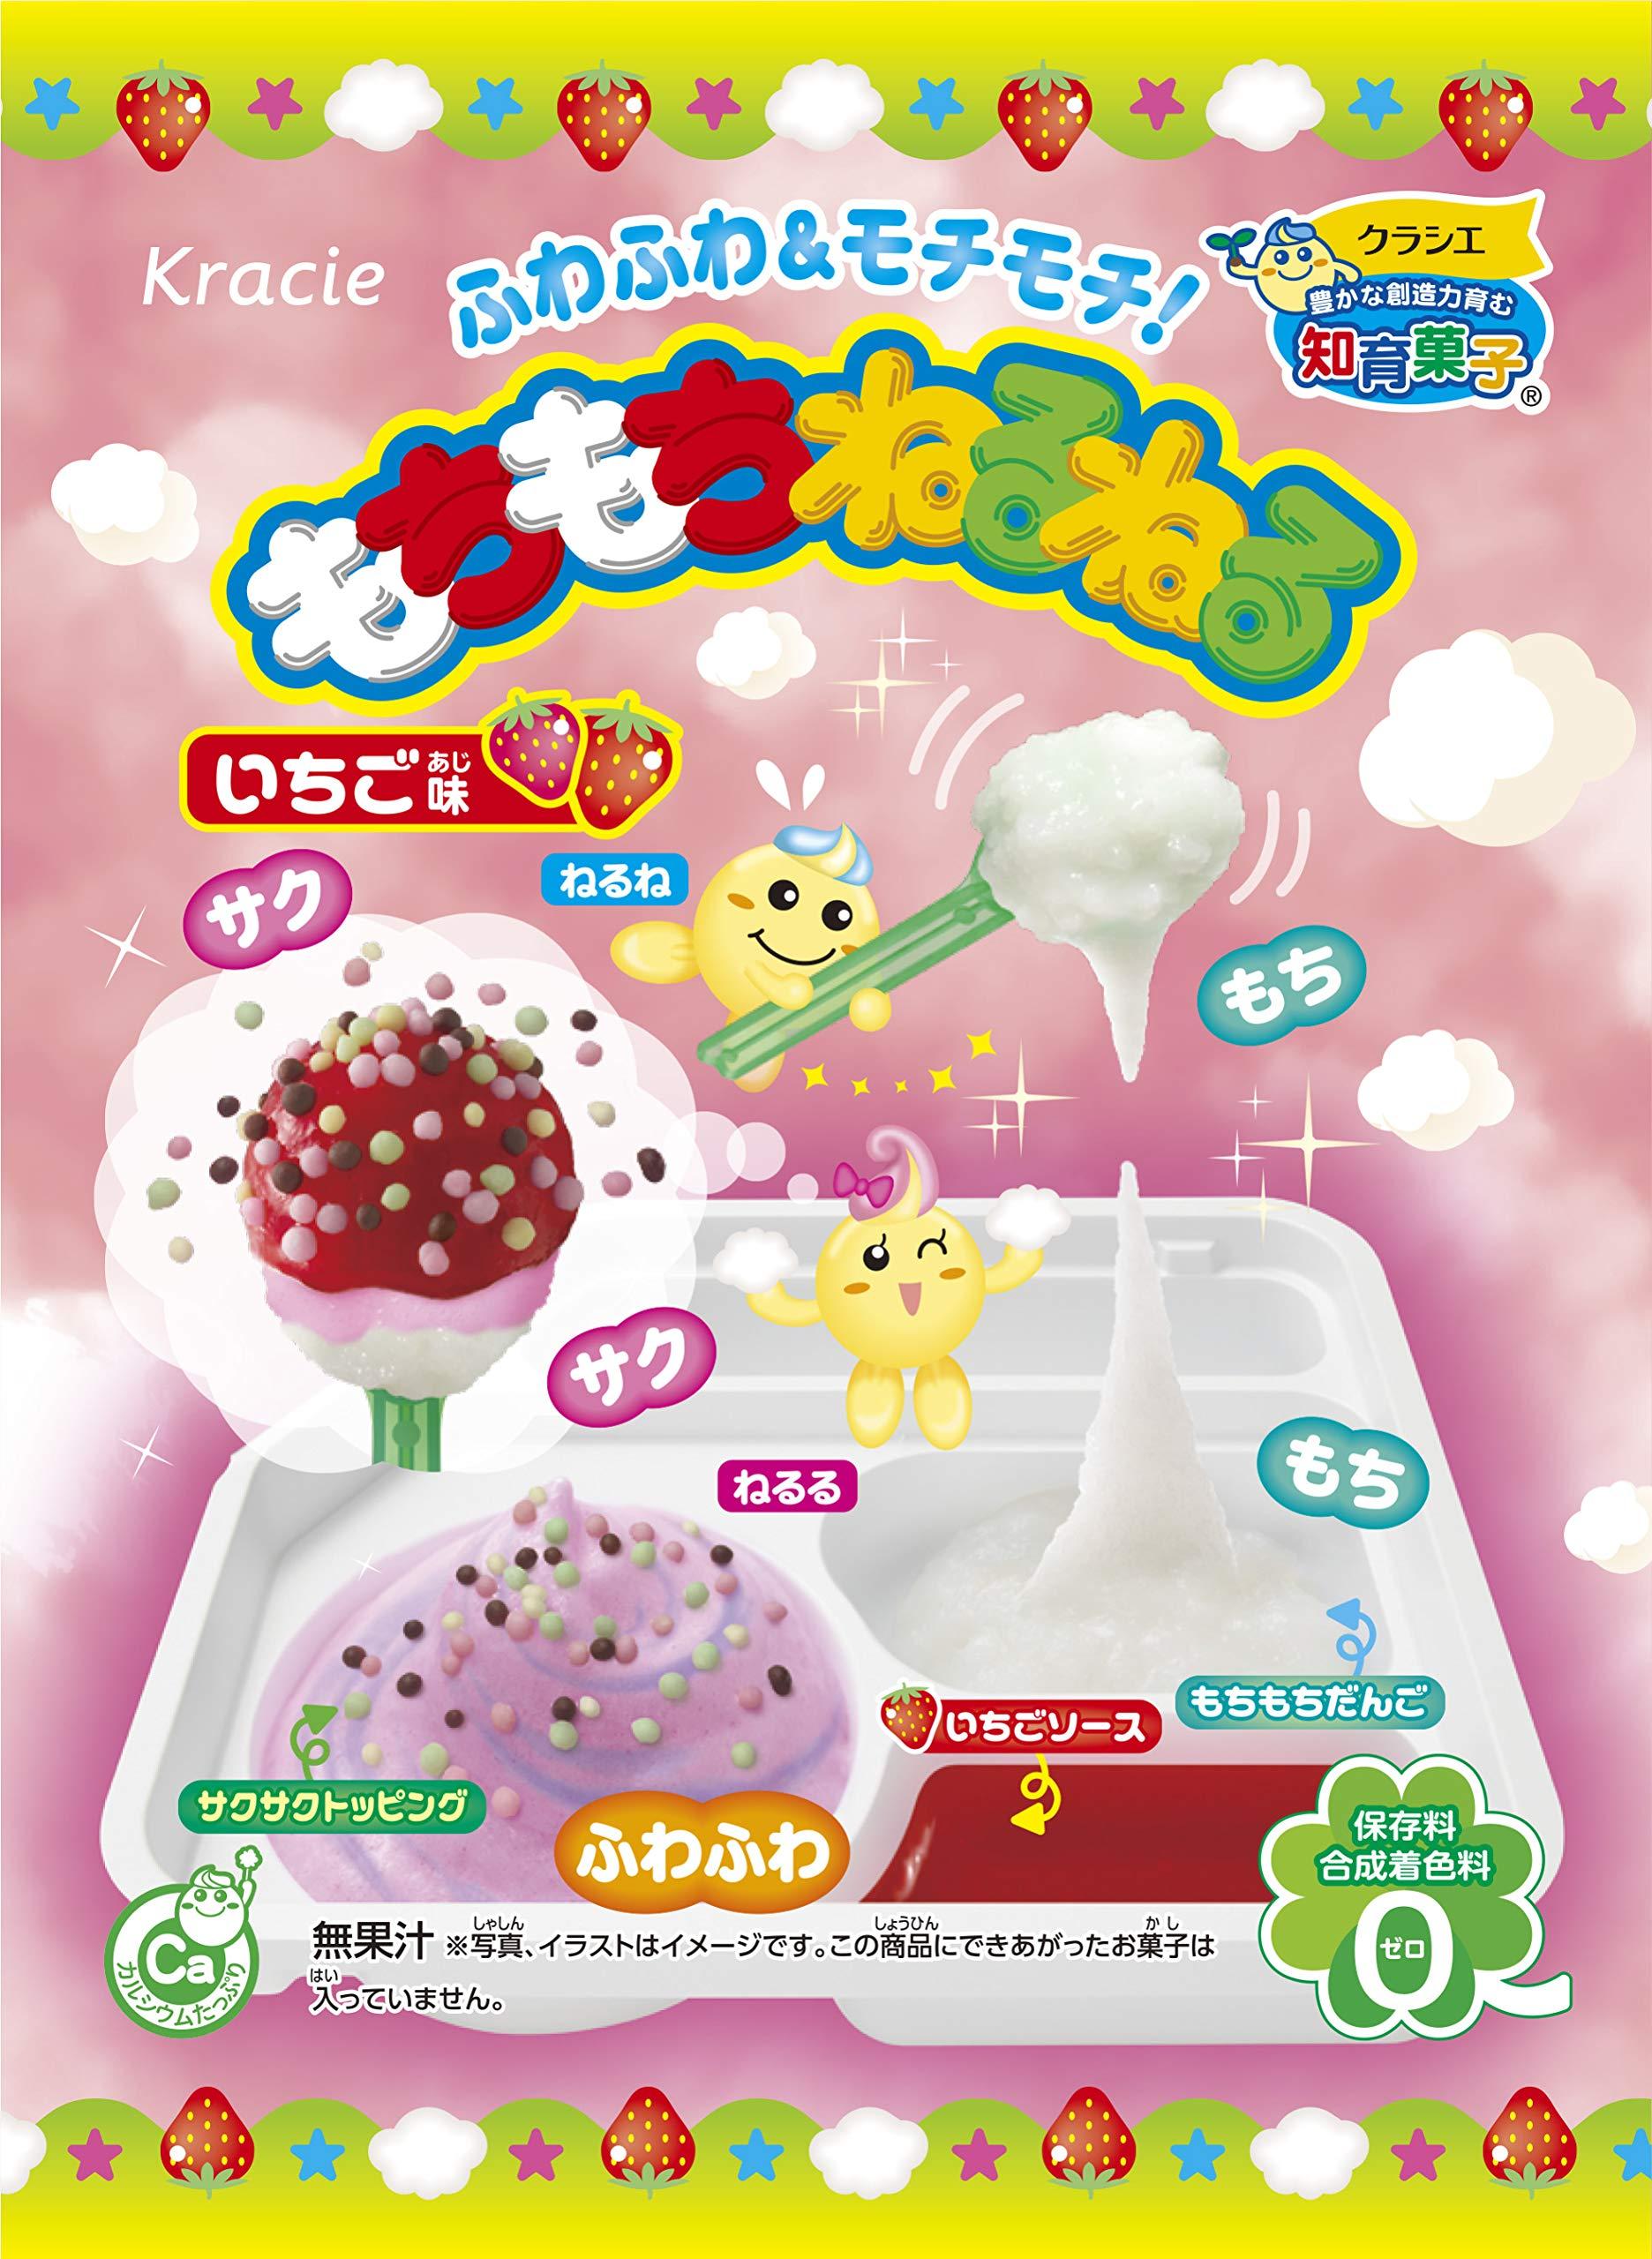 Kracie Popin Cookin DIY Happy Kitchen Japanese Making Candy Kit Mochi Mochi neru neru Ichigo aji by Kracie